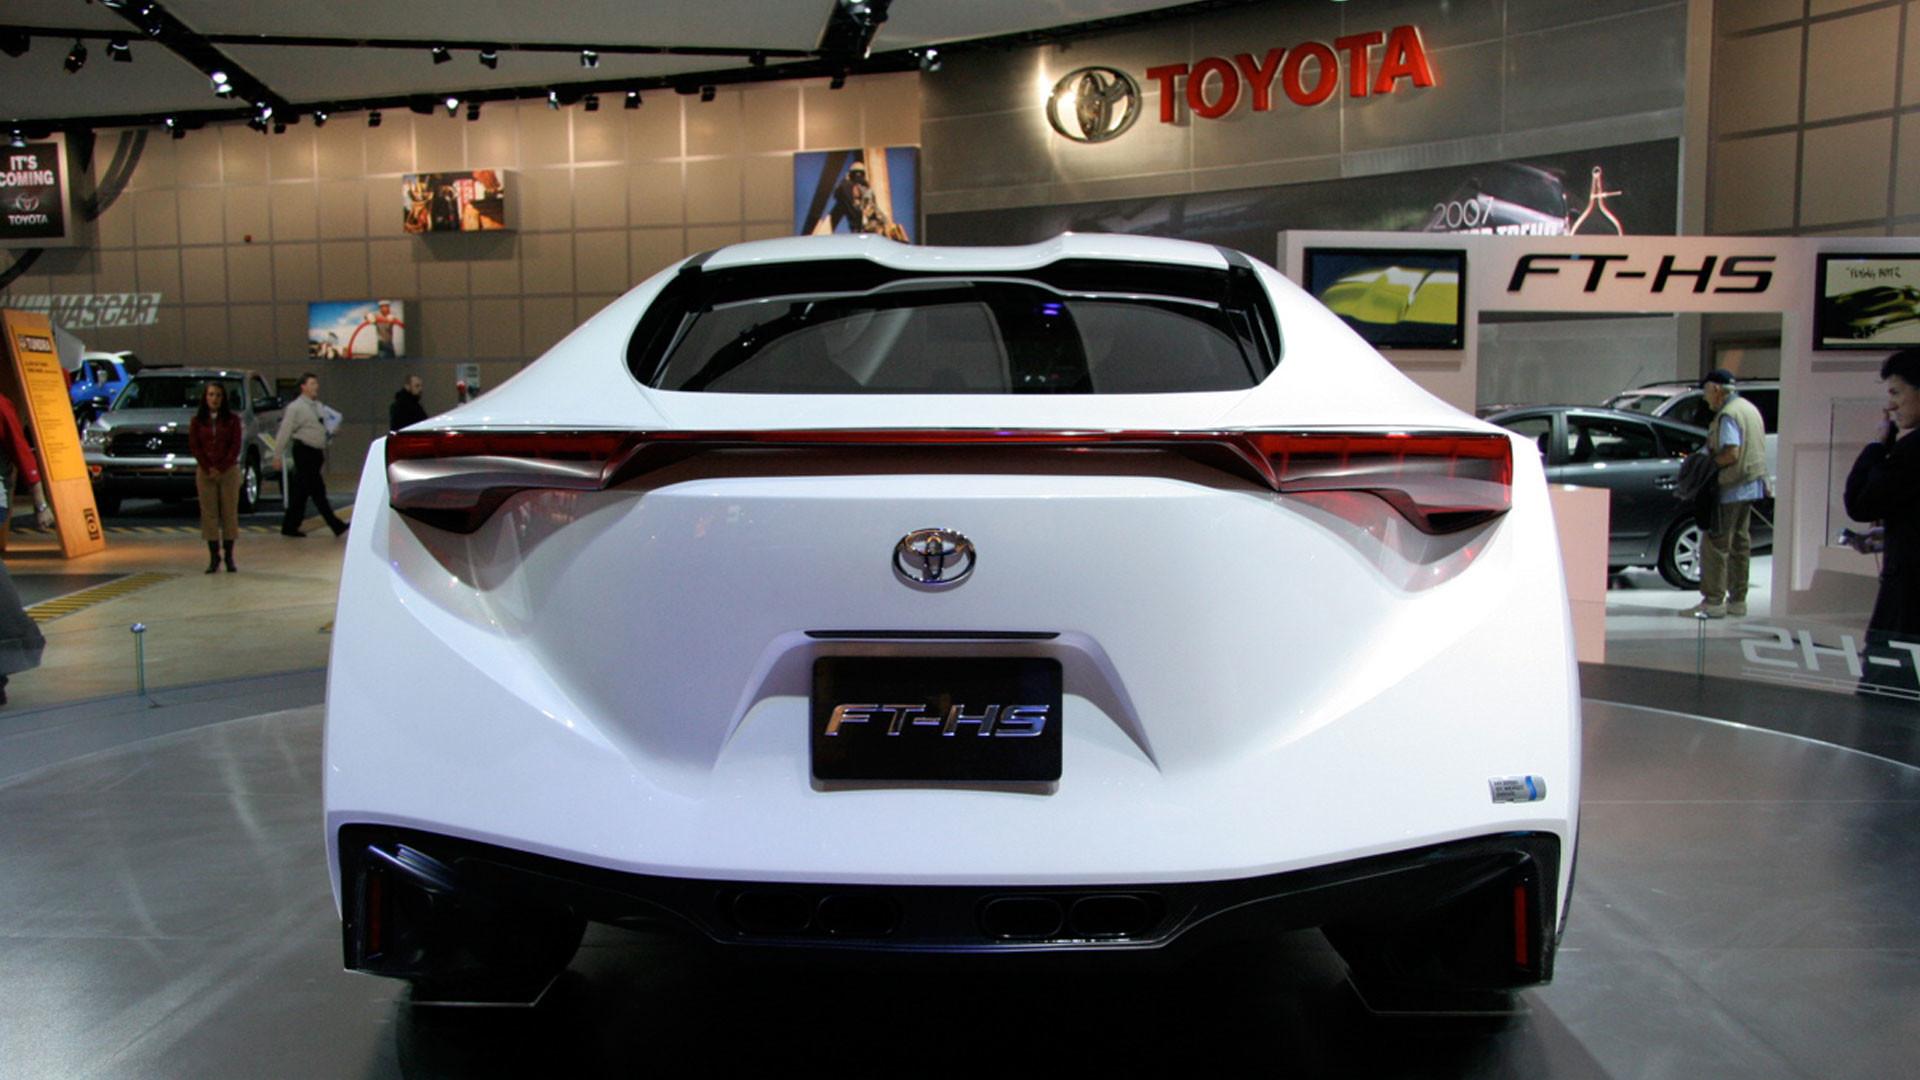 2015 Toyota Supra Mobile HD Wallpaper